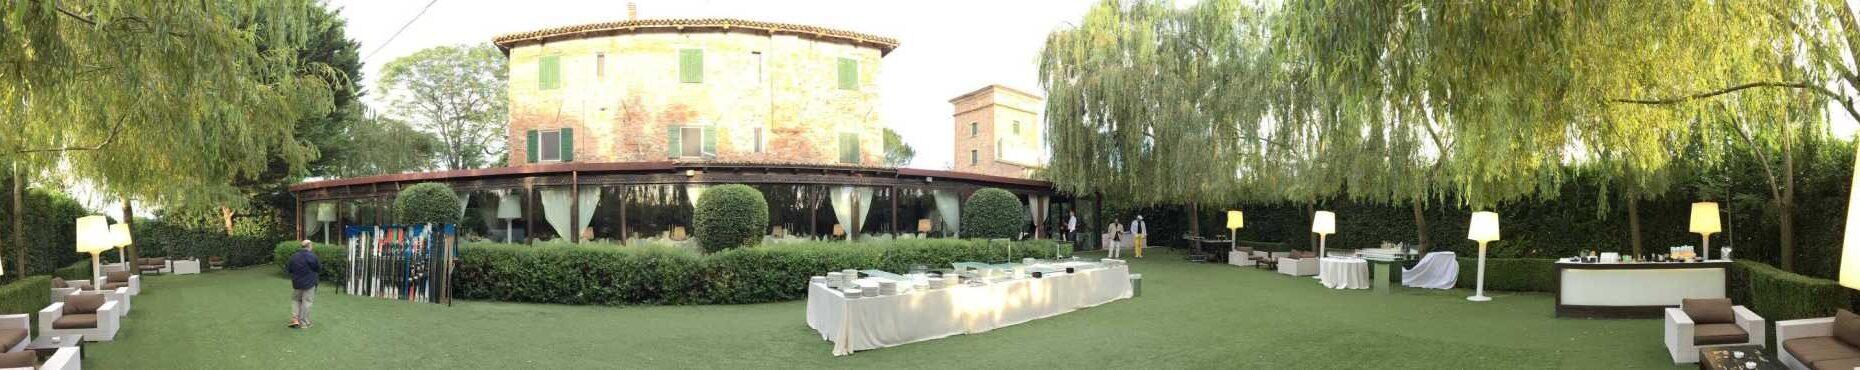 Palazzo Guidi Santarcangelo - La Location